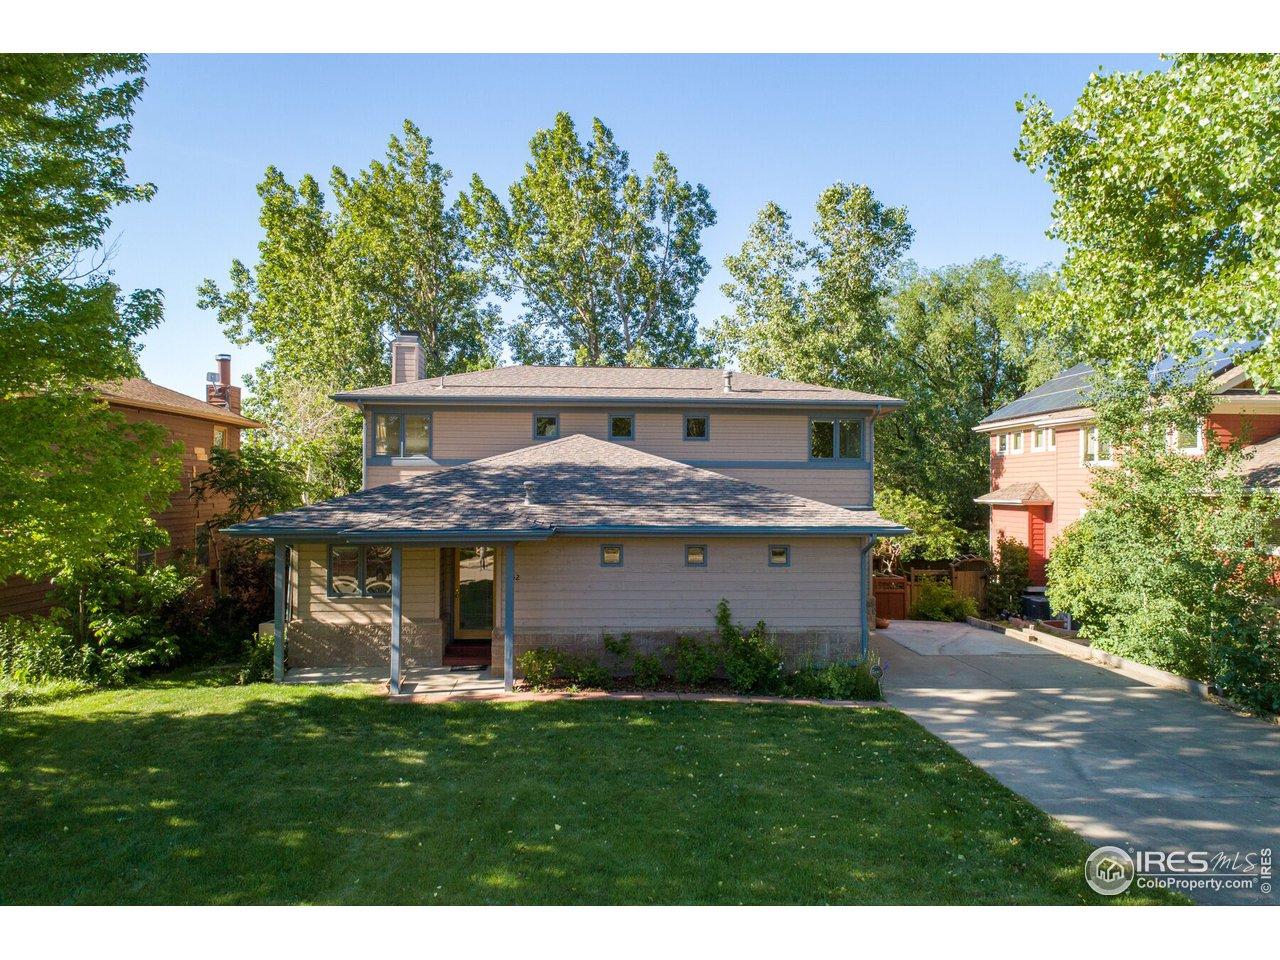 932 Locust Ave, Boulder CO 80304